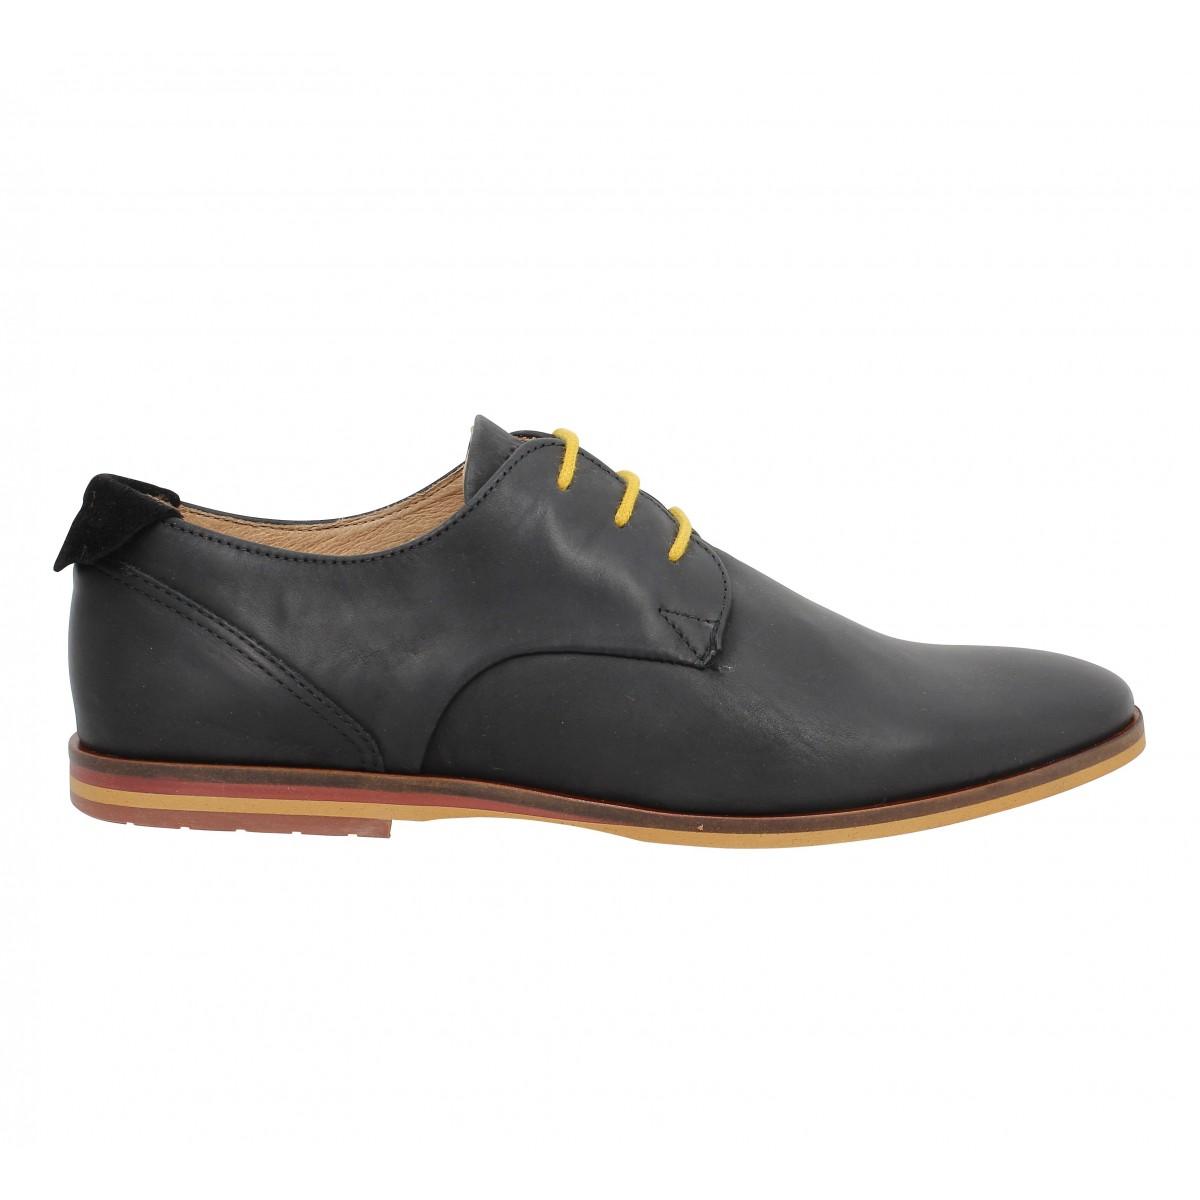 soldes schmoove swan derby noir homme fanny chaussures. Black Bedroom Furniture Sets. Home Design Ideas